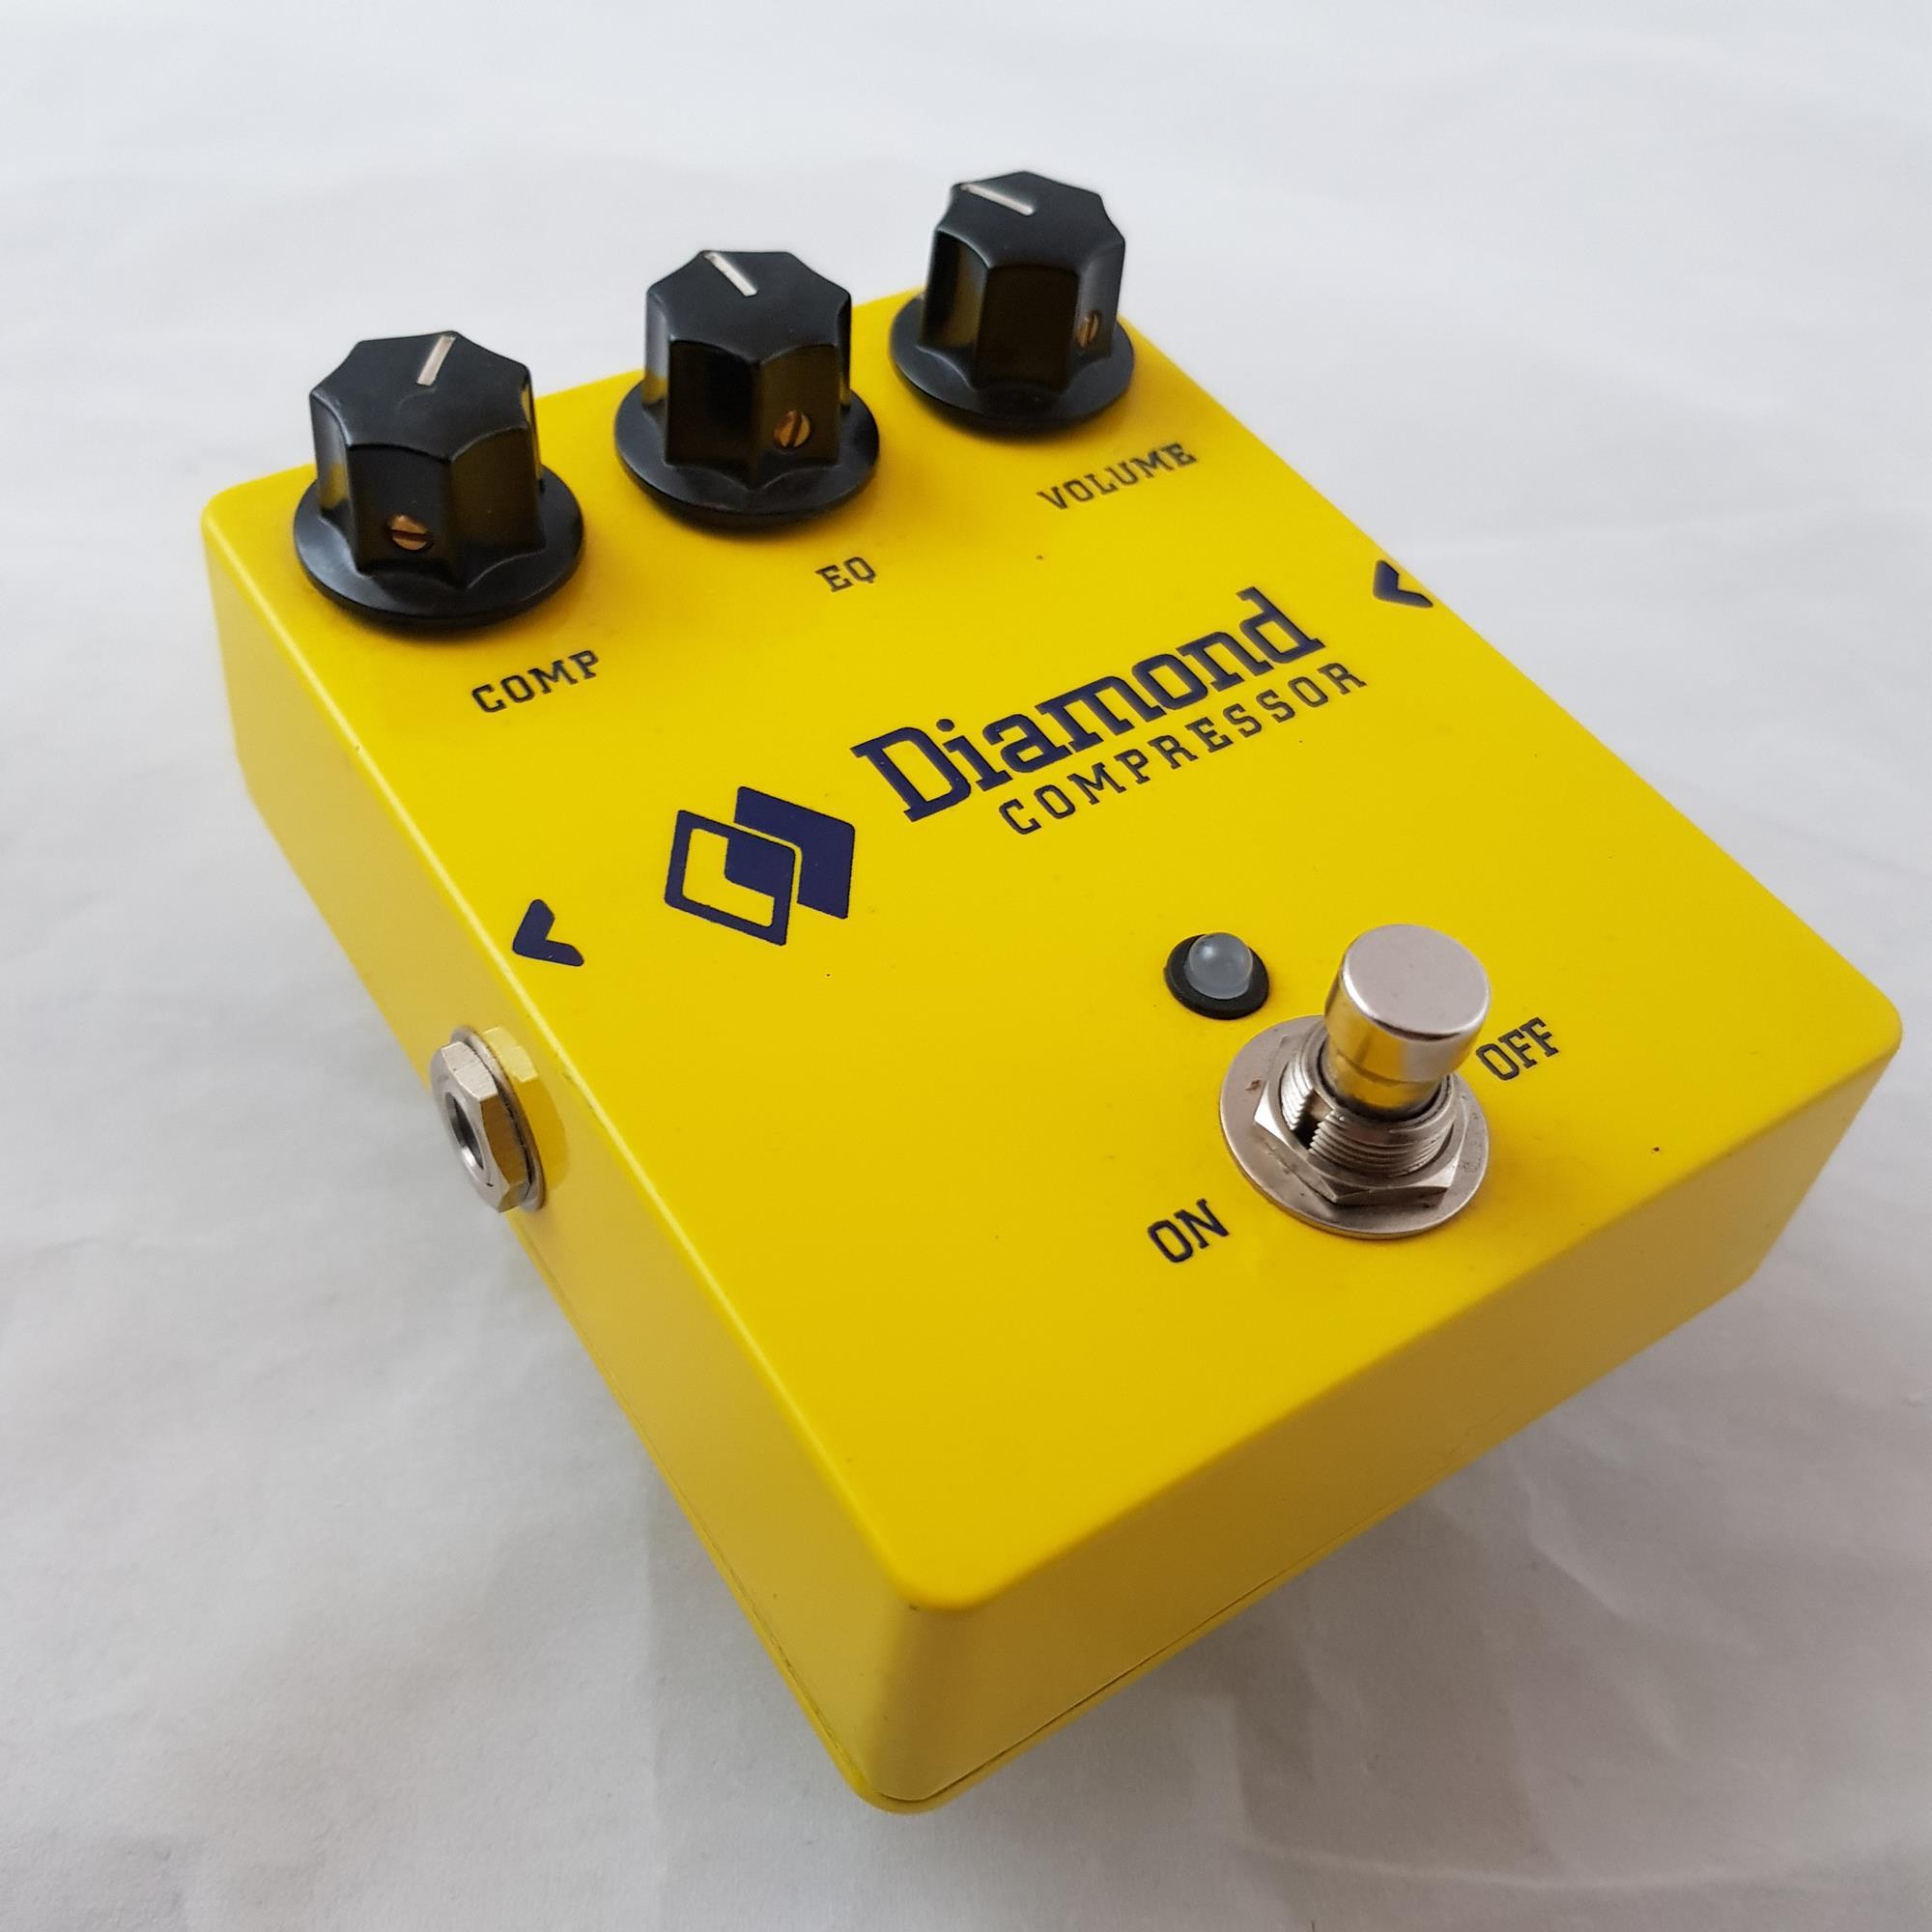 DIAMOND-CPR-1-COMPRESSOR-PEDAL-sku-1602345766124